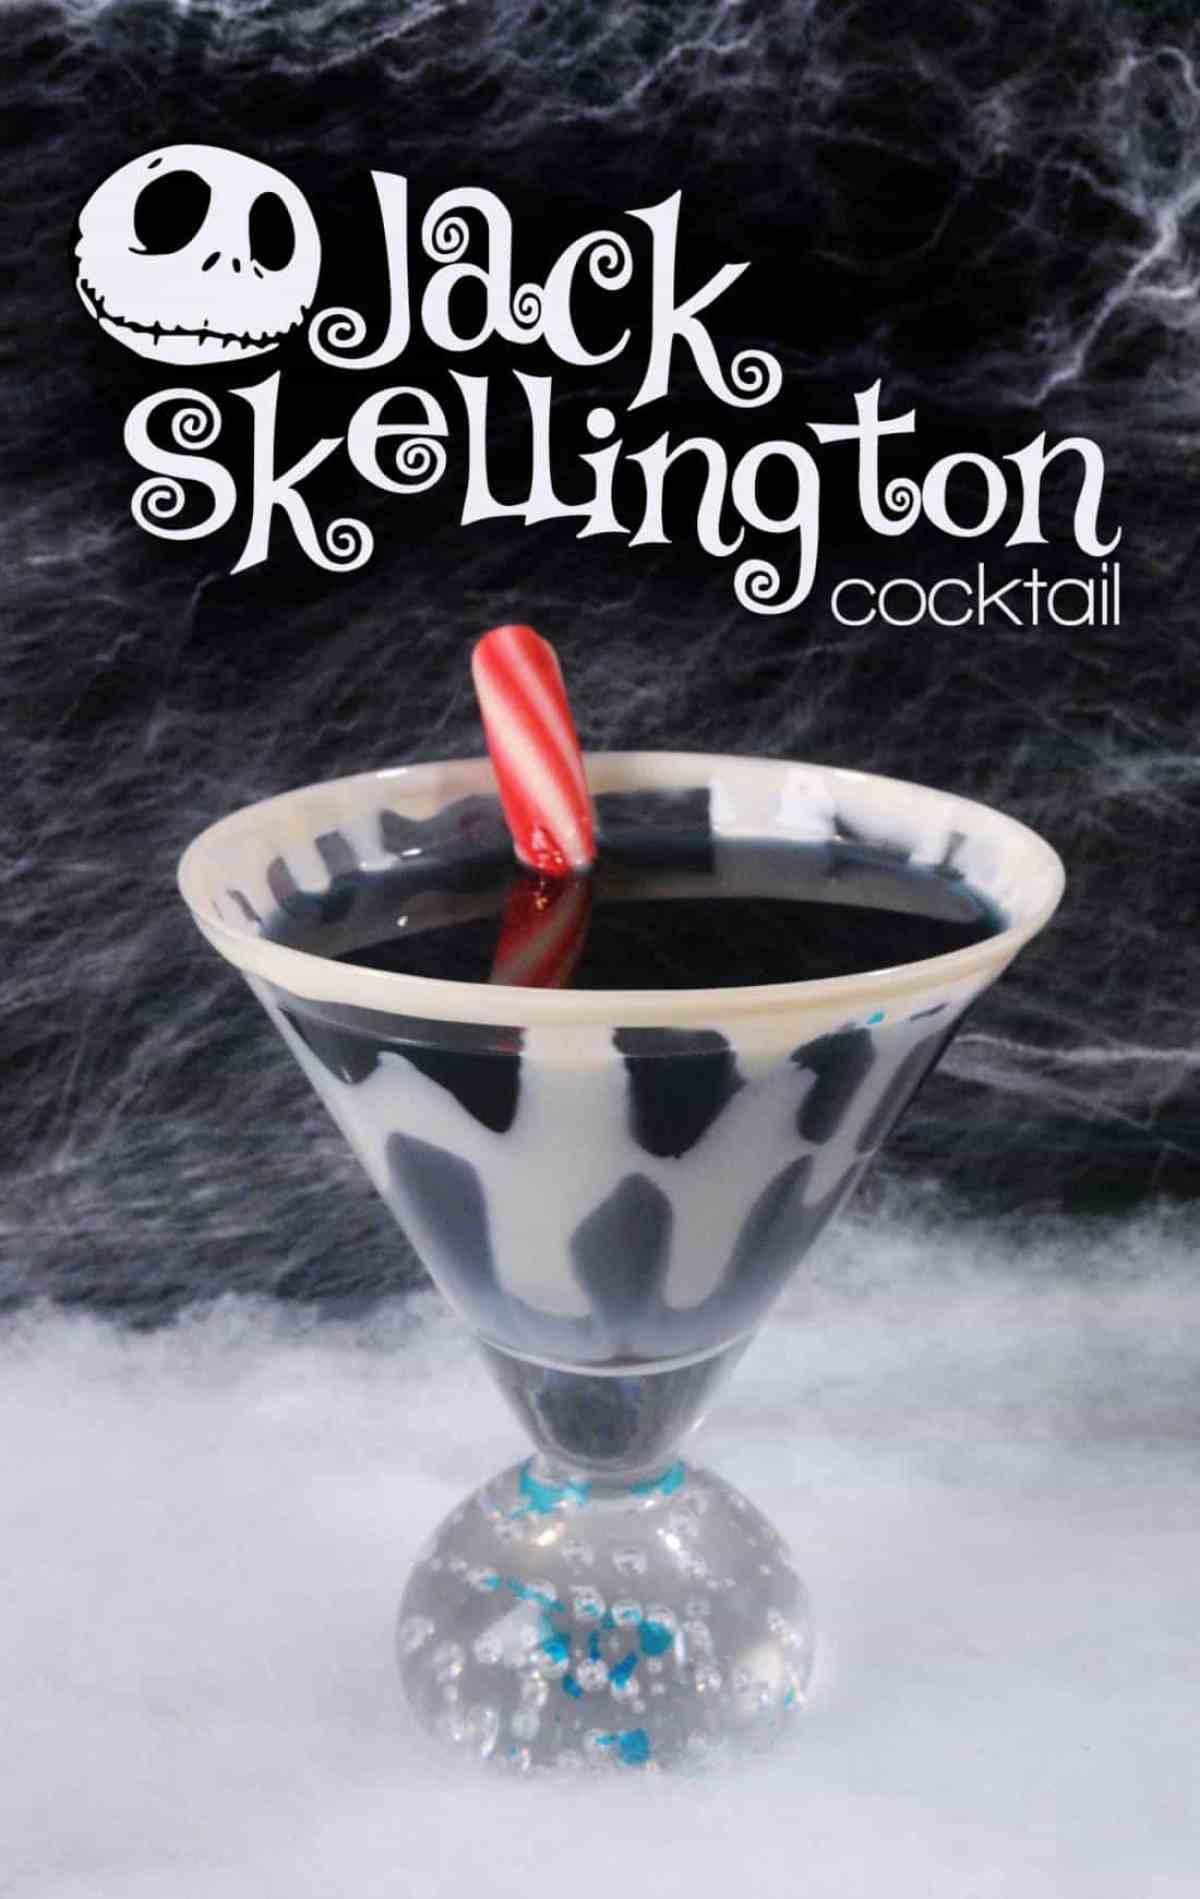 jack-skellington-cocktail-pinterest